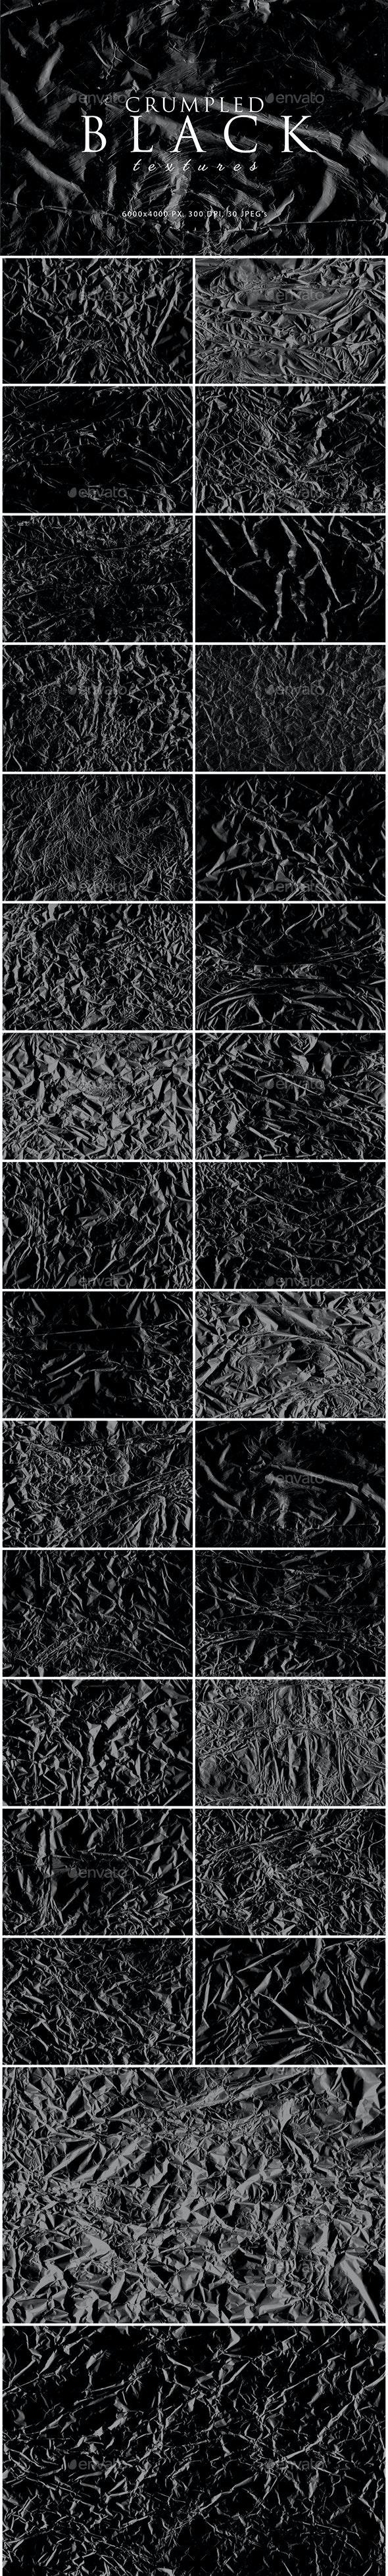 Black Crumpled Textures - Miscellaneous Textures